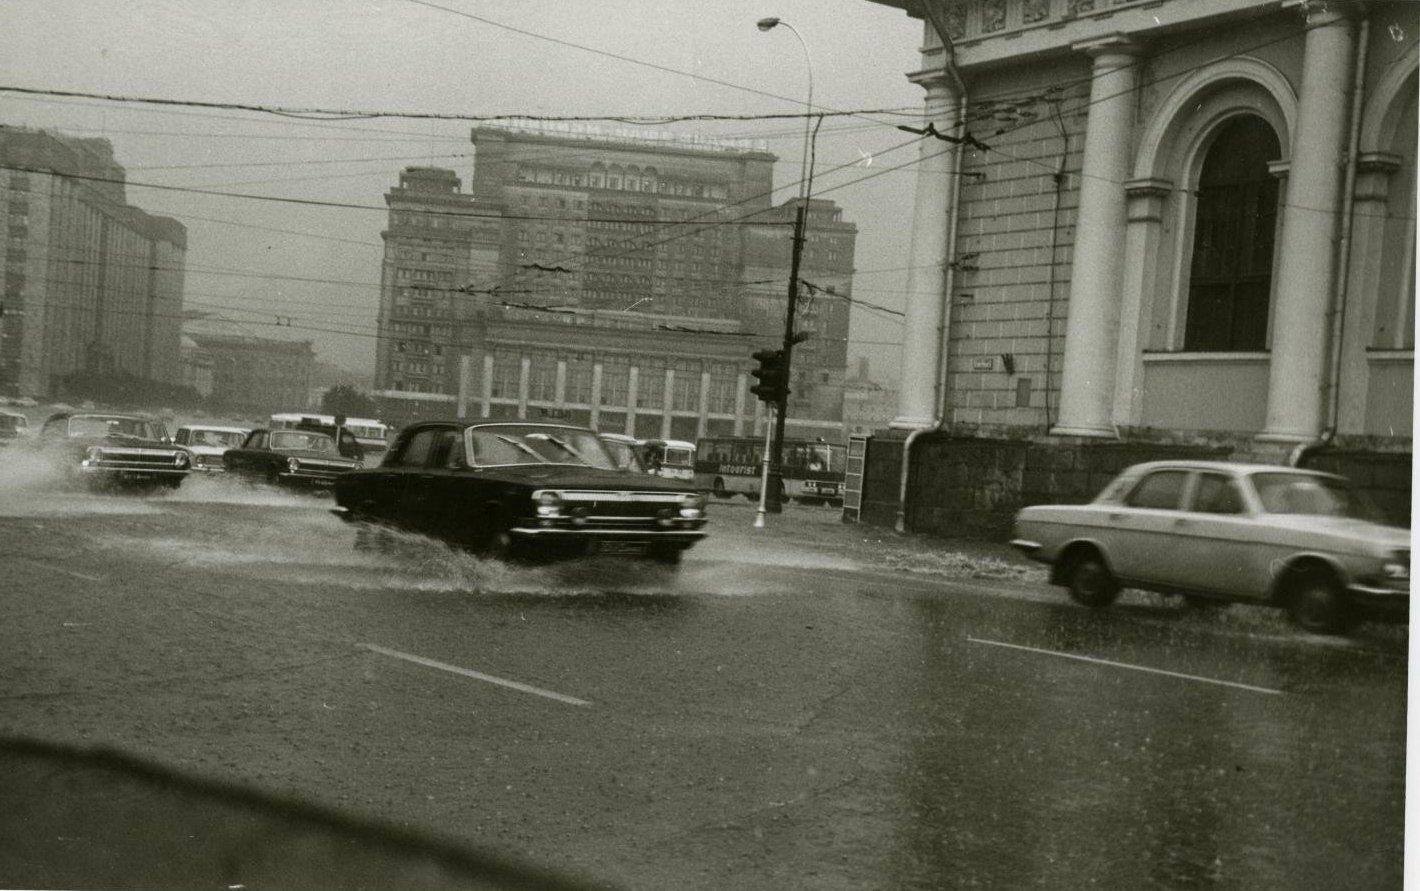 1970-е. Вид на гостиницу «Москва» и движущийся перед ней транспорт во время сильного дождя (4)